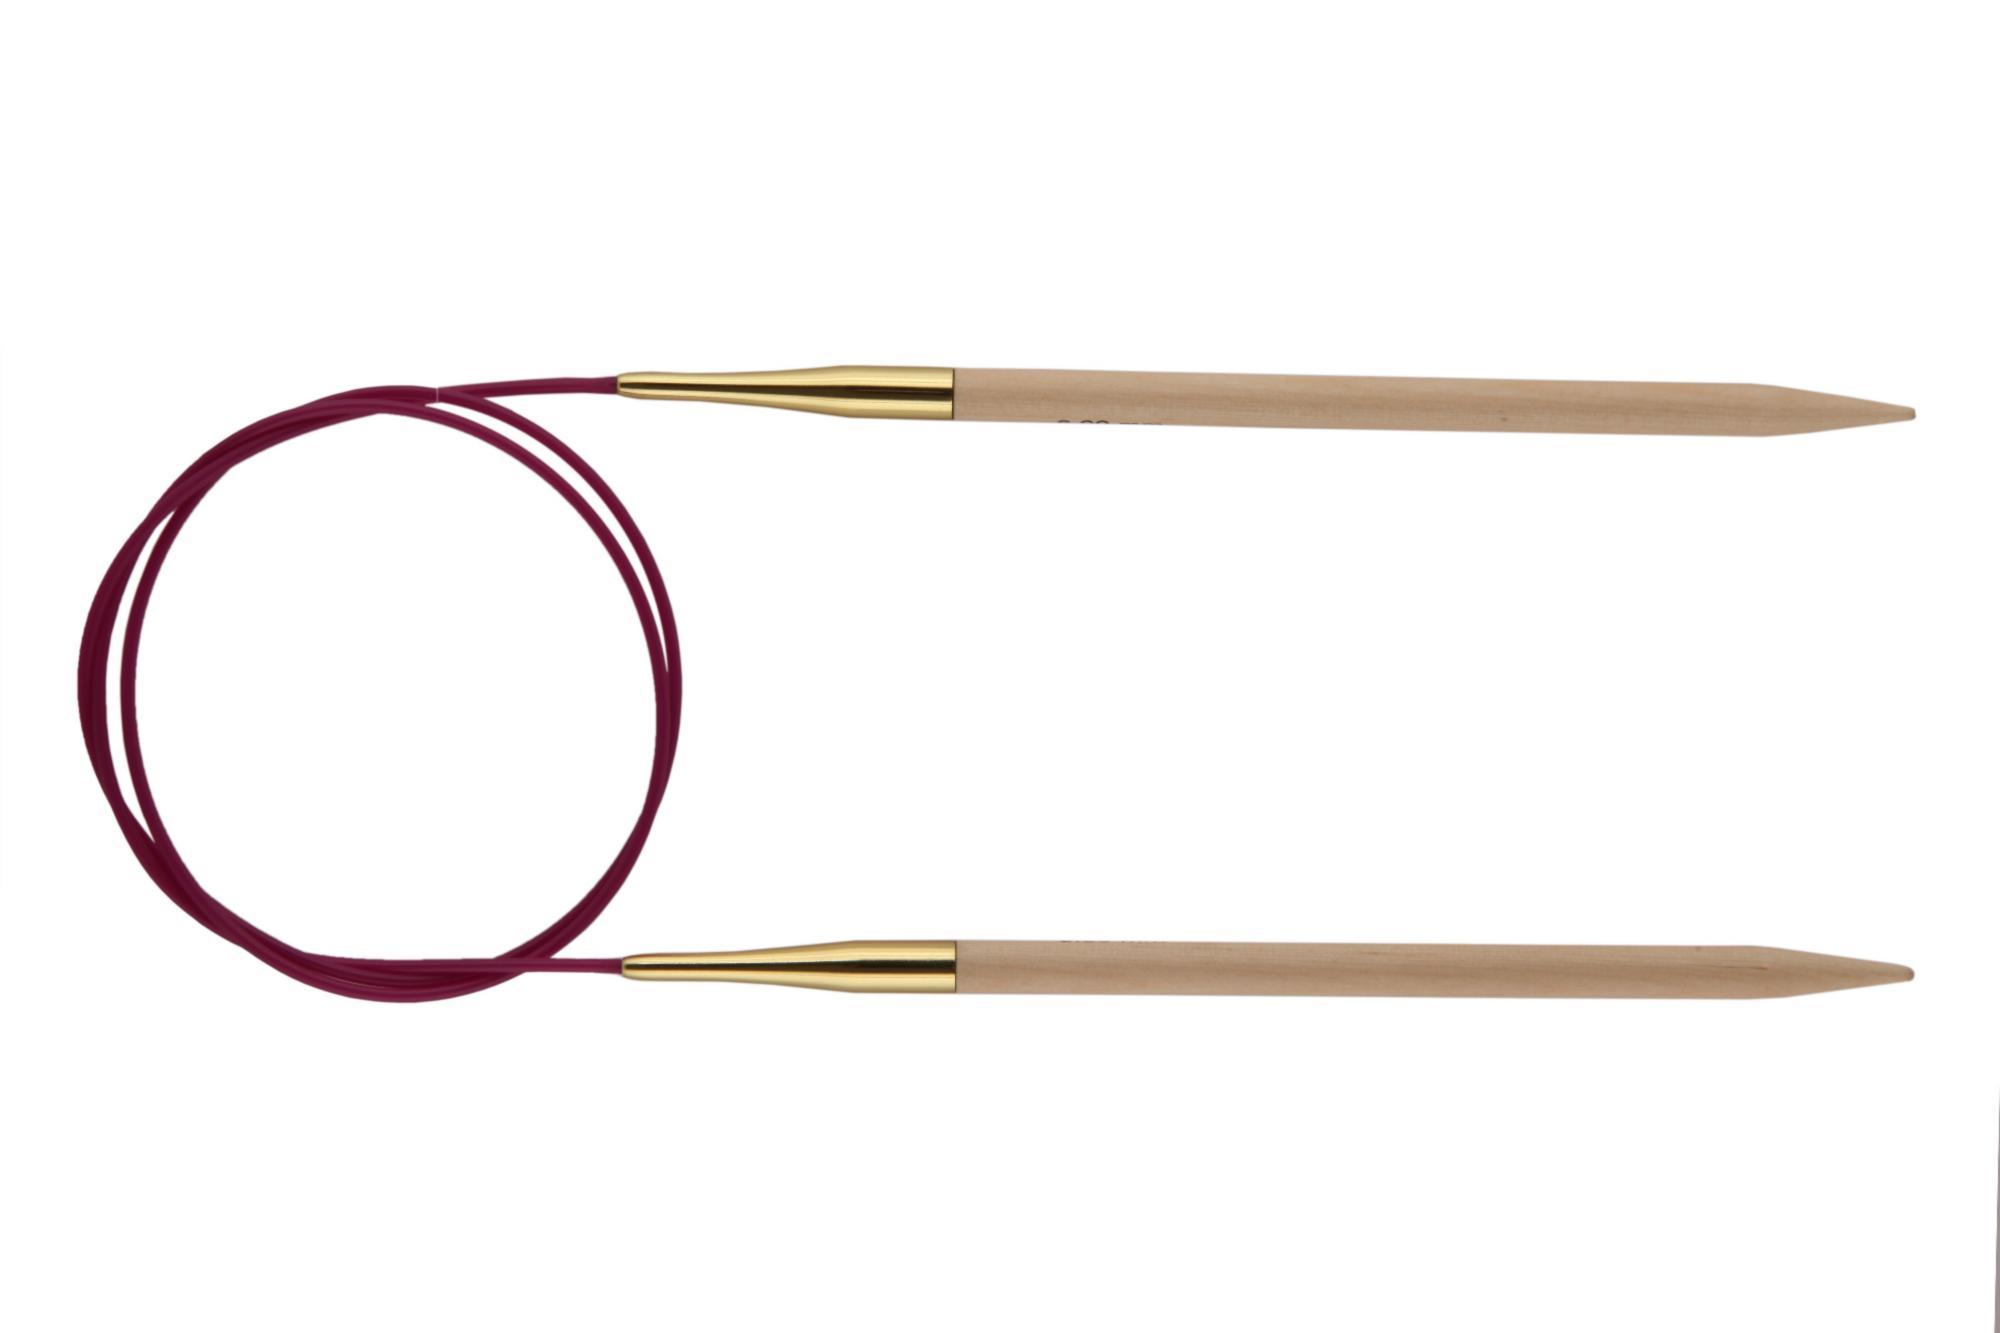 Спицы круговые 60 см Basix Birch Wood KnitPro, 35606, 3.25 мм